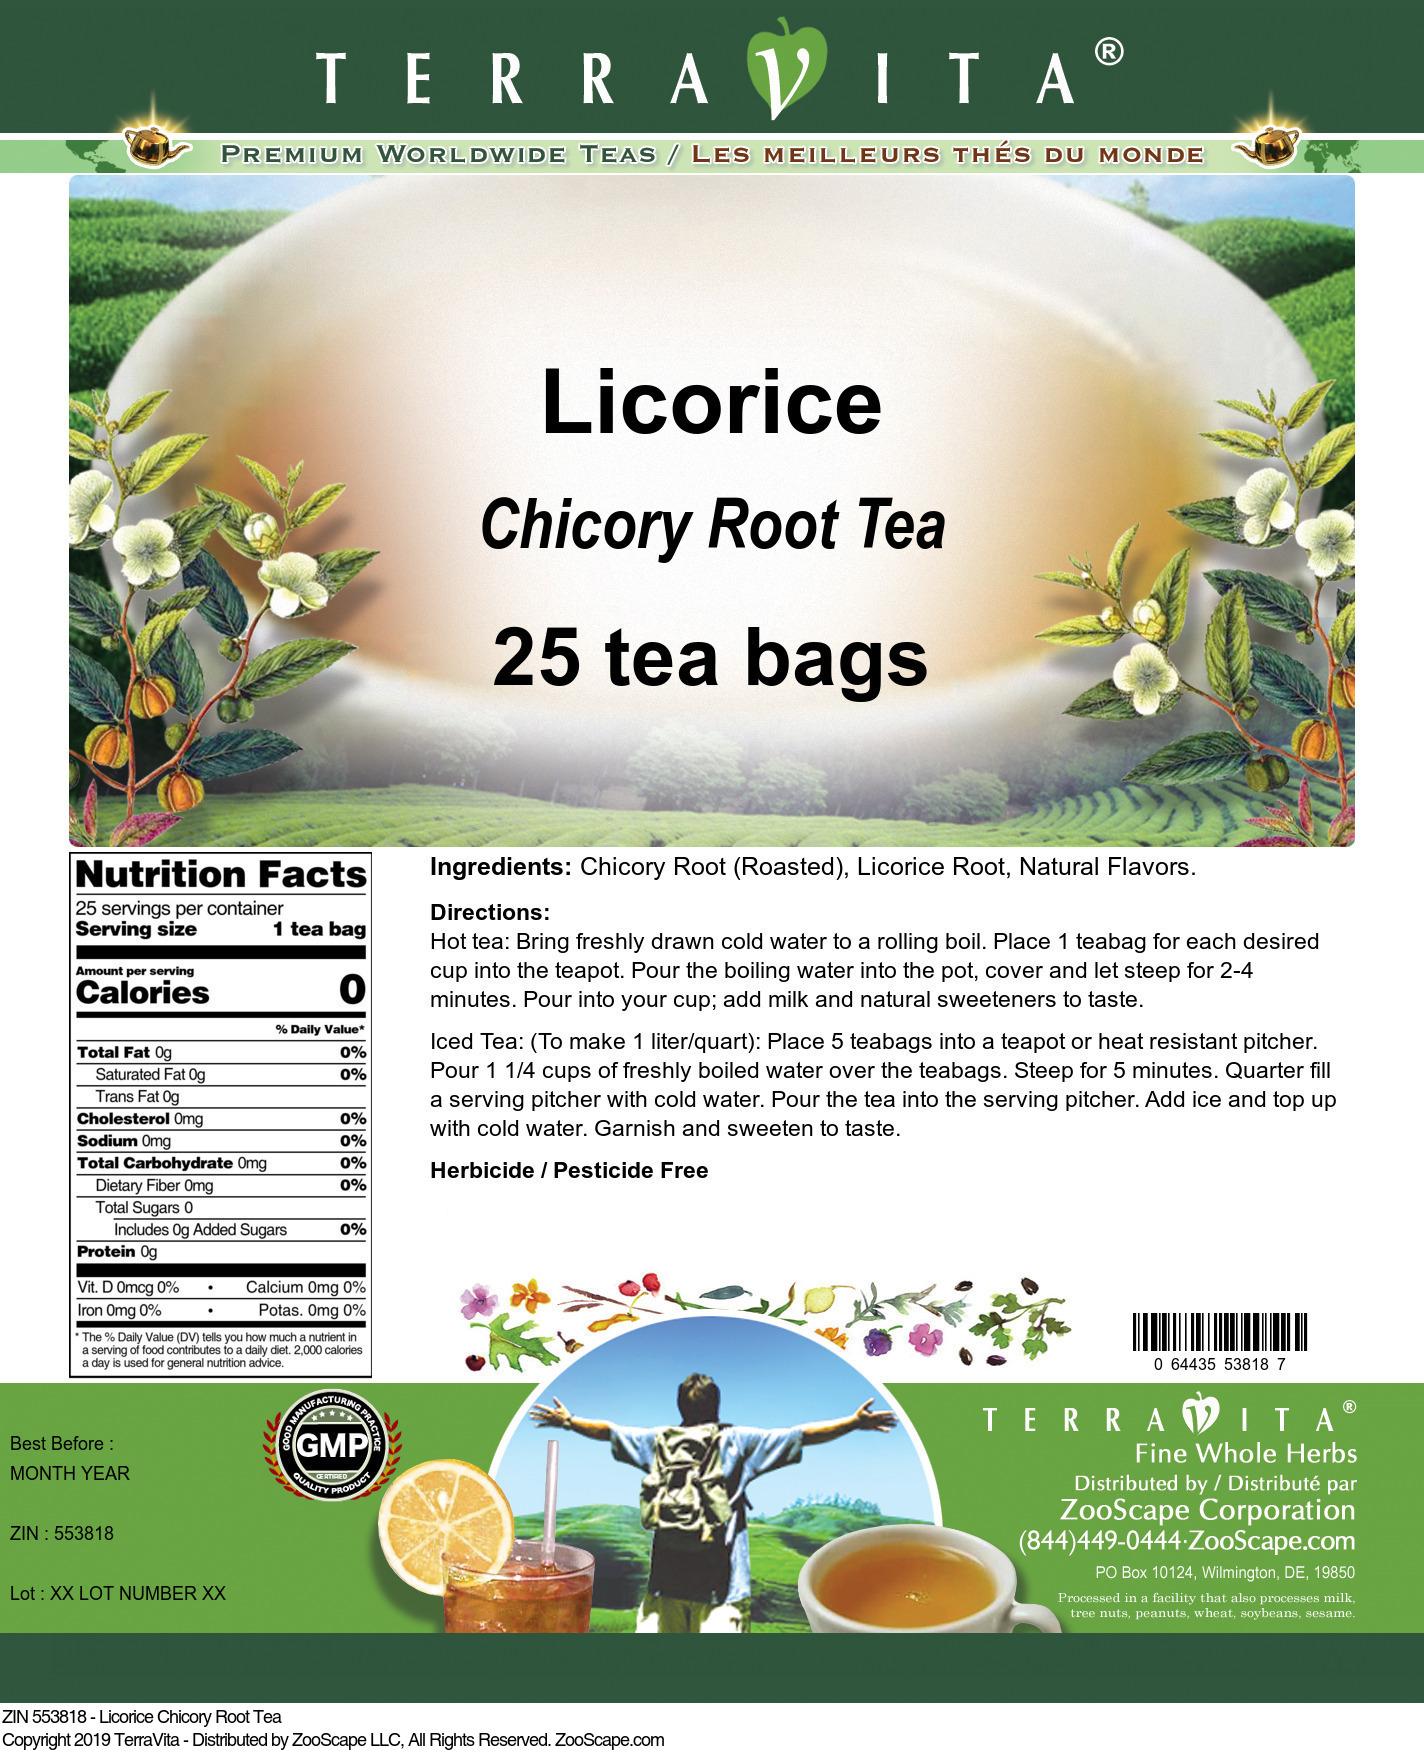 Licorice Chicory Root Tea